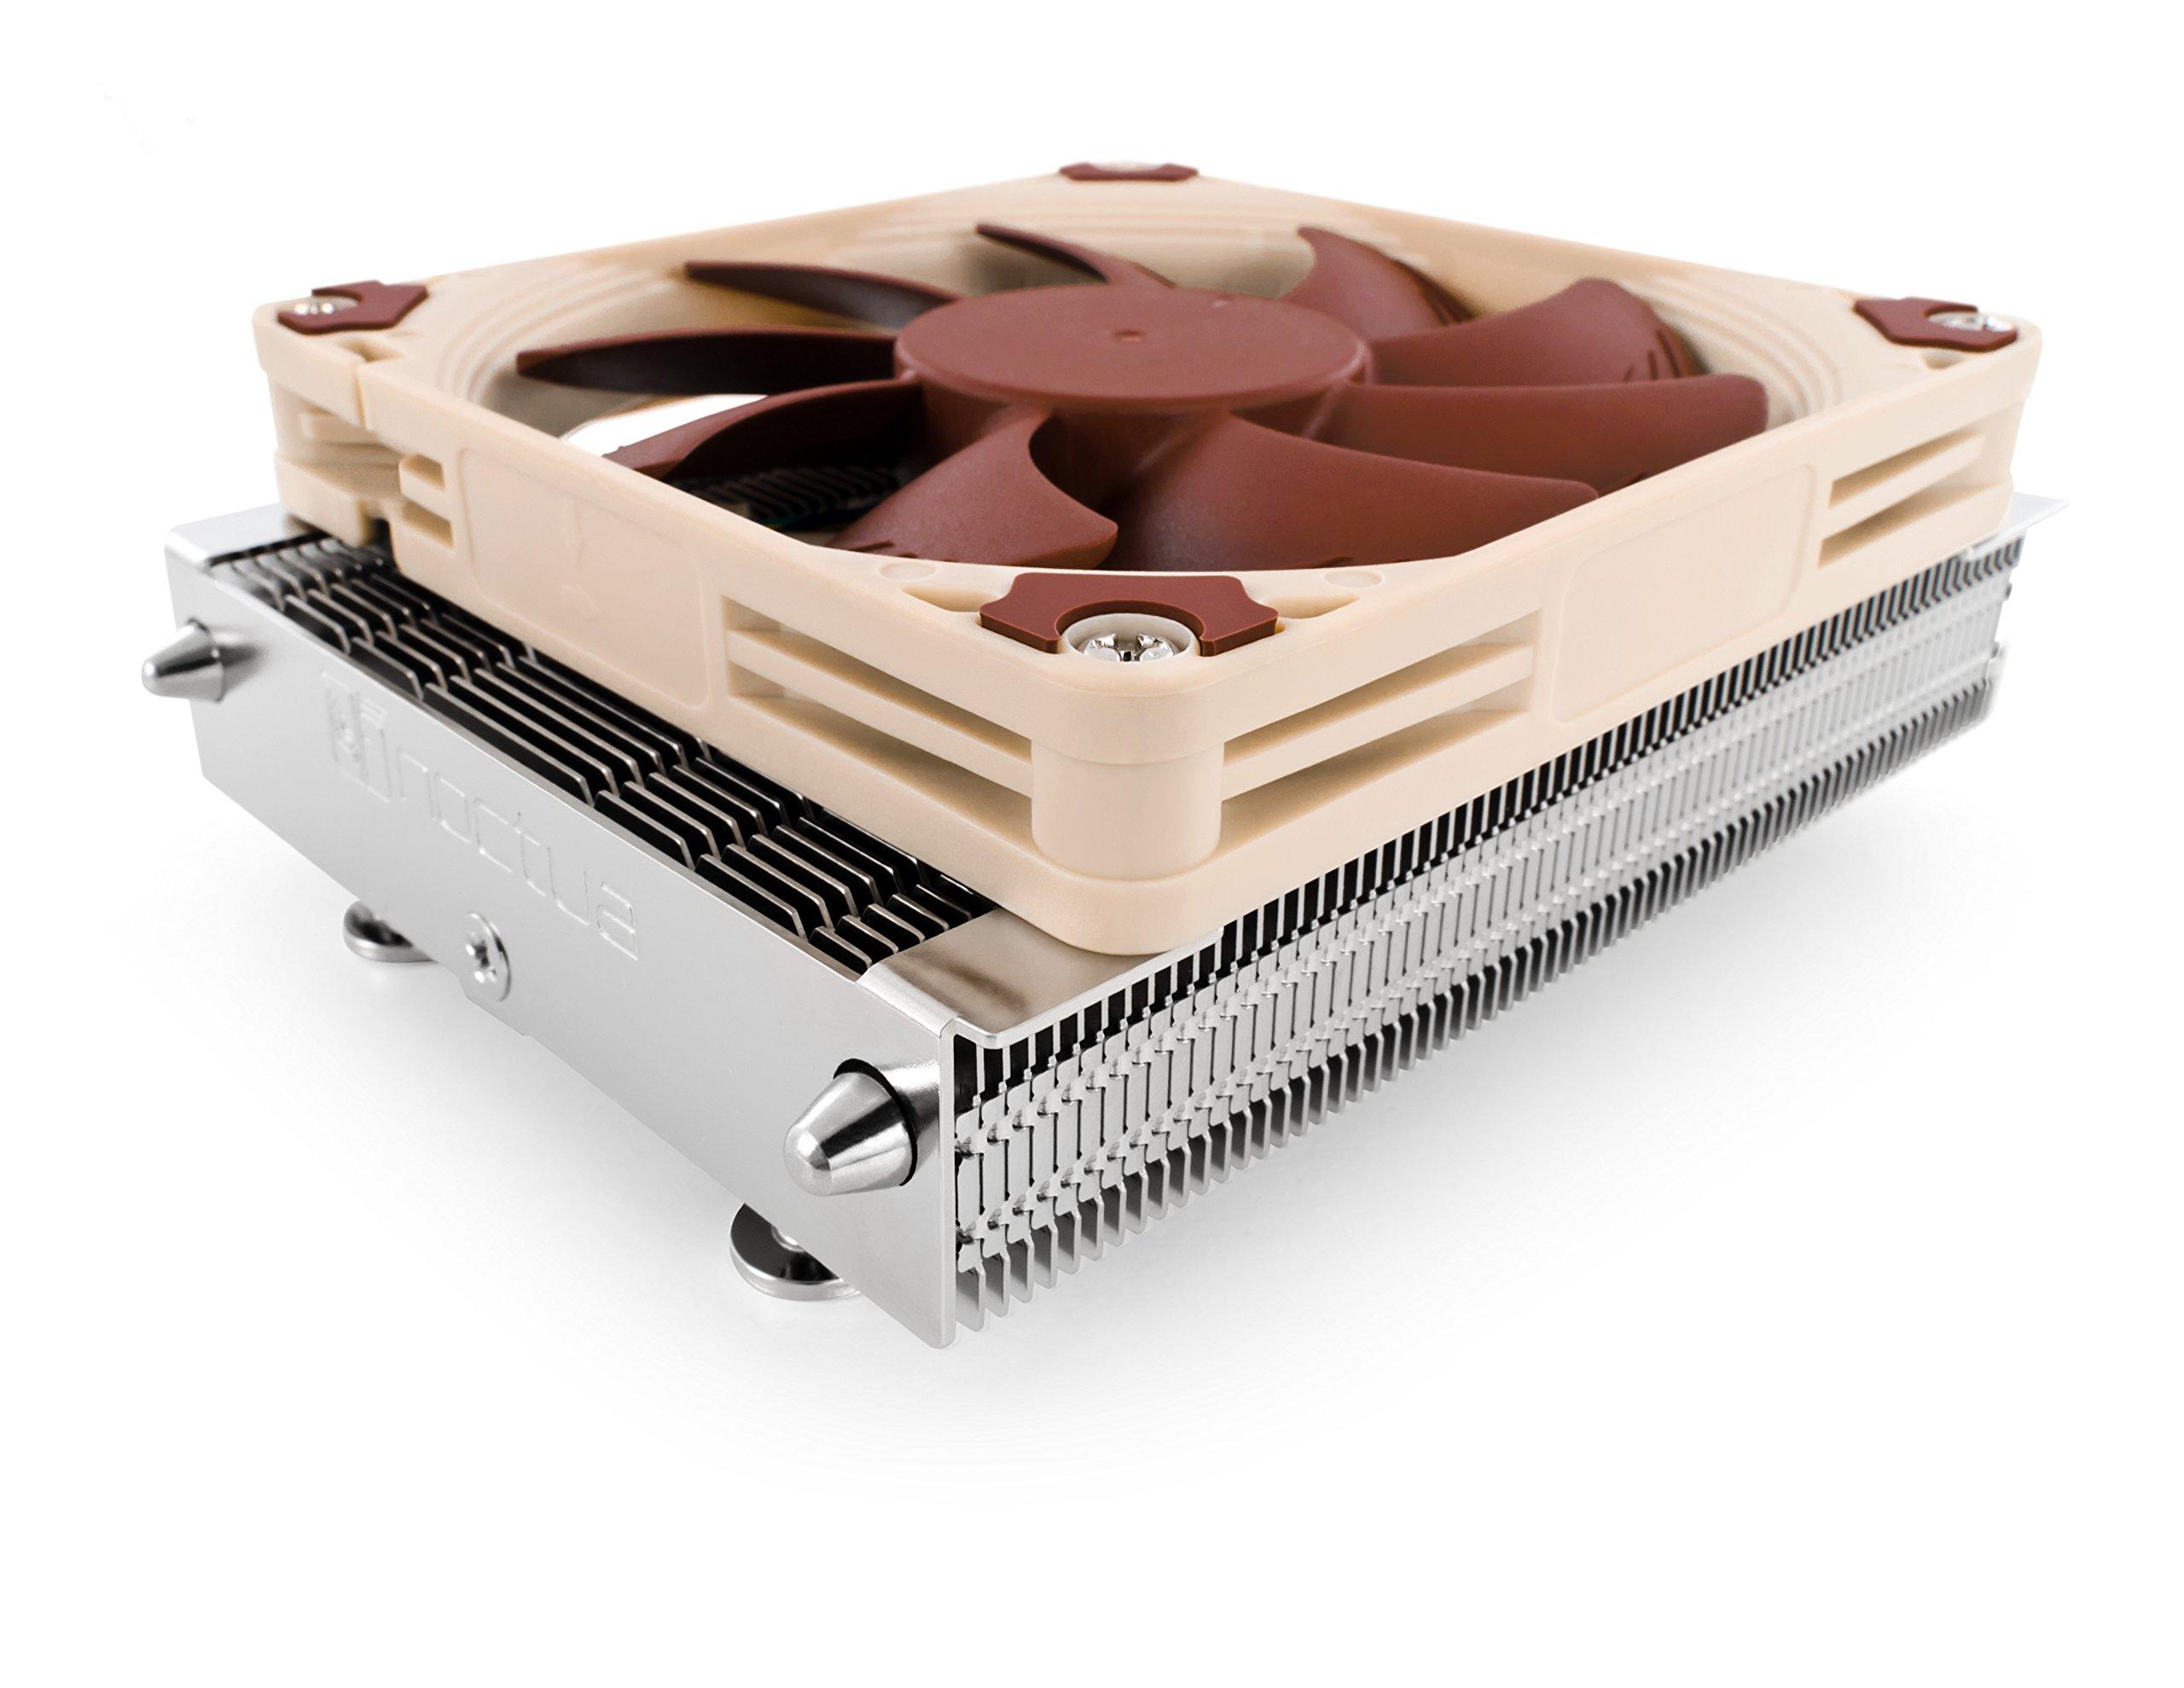 Noctua NH-L9a AM4, 37mm Premium Low-profile CPU Cooler for A